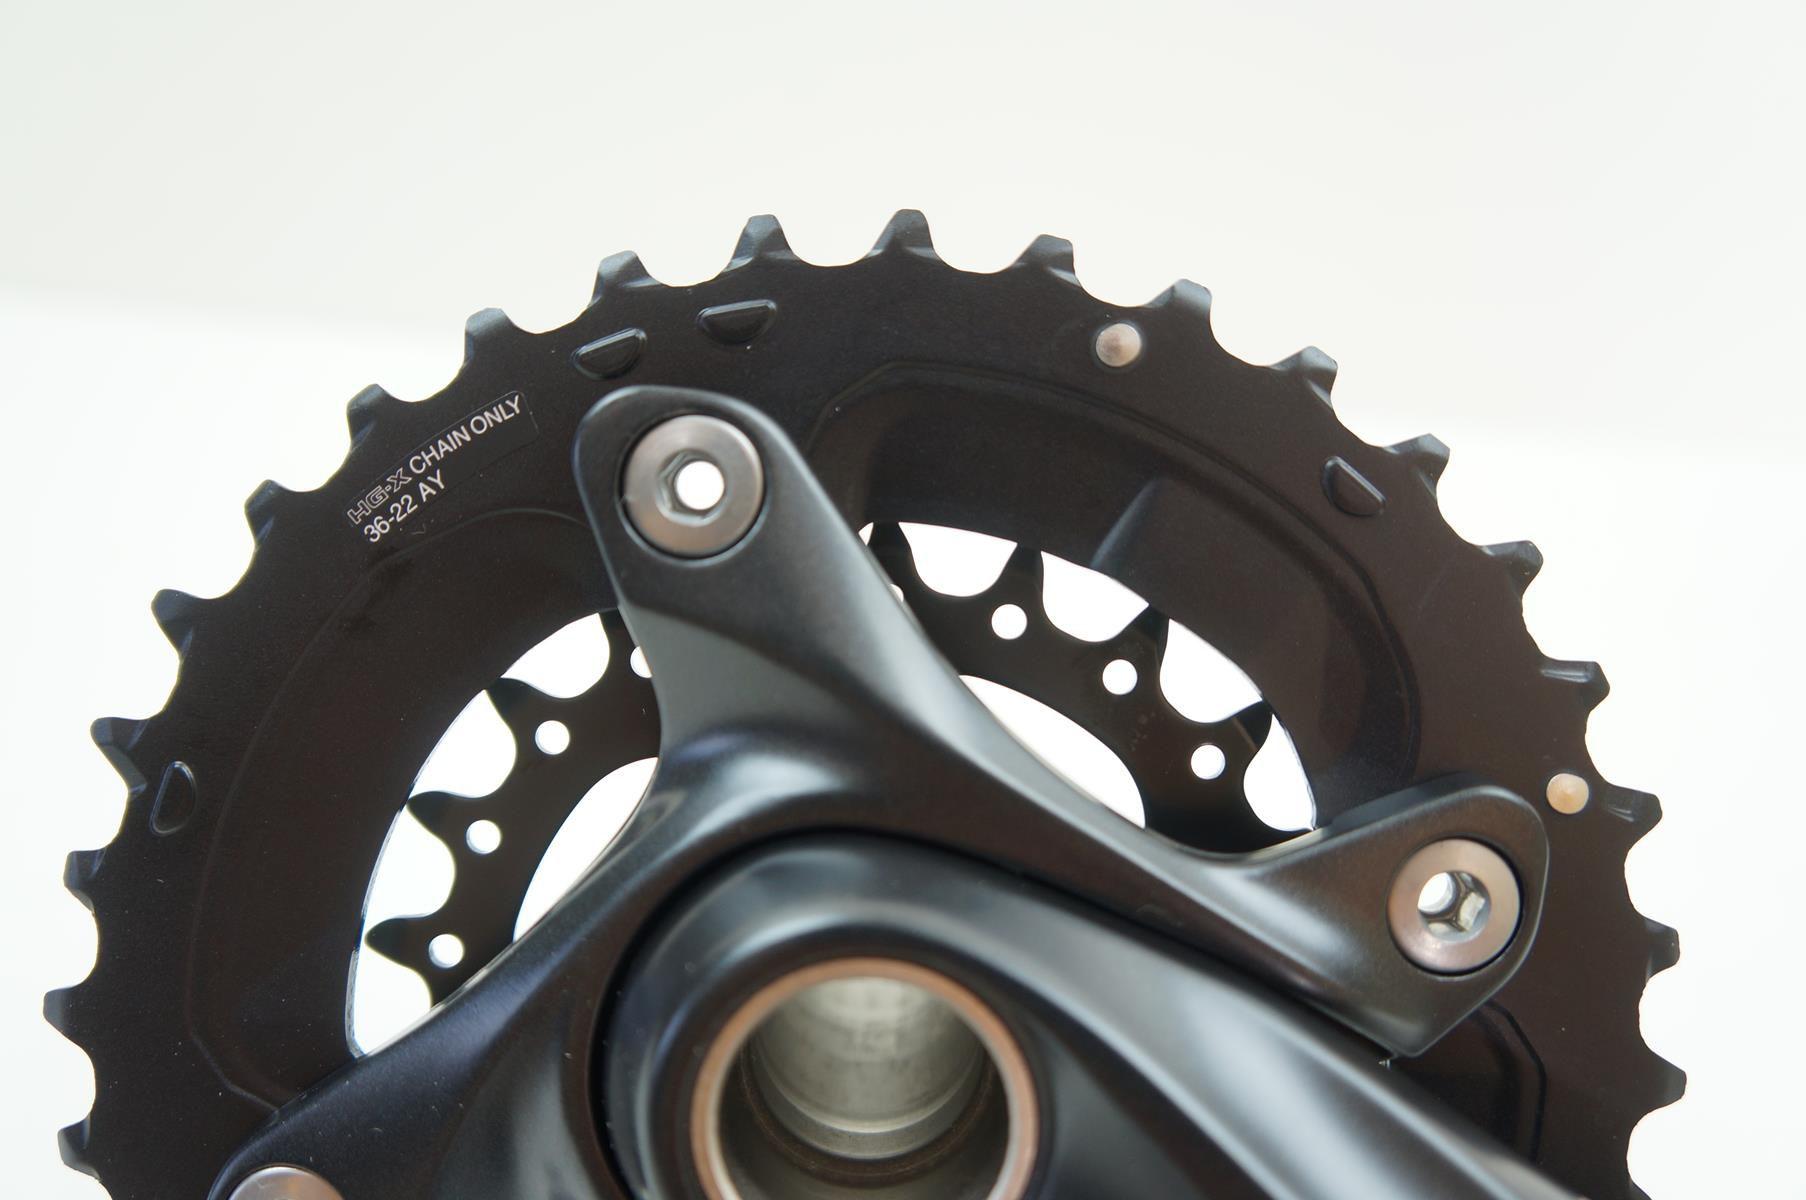 Pedivela Duplo Bicicleta Shimano Deore M617 2x10 36-22 175mm 10 velocidades